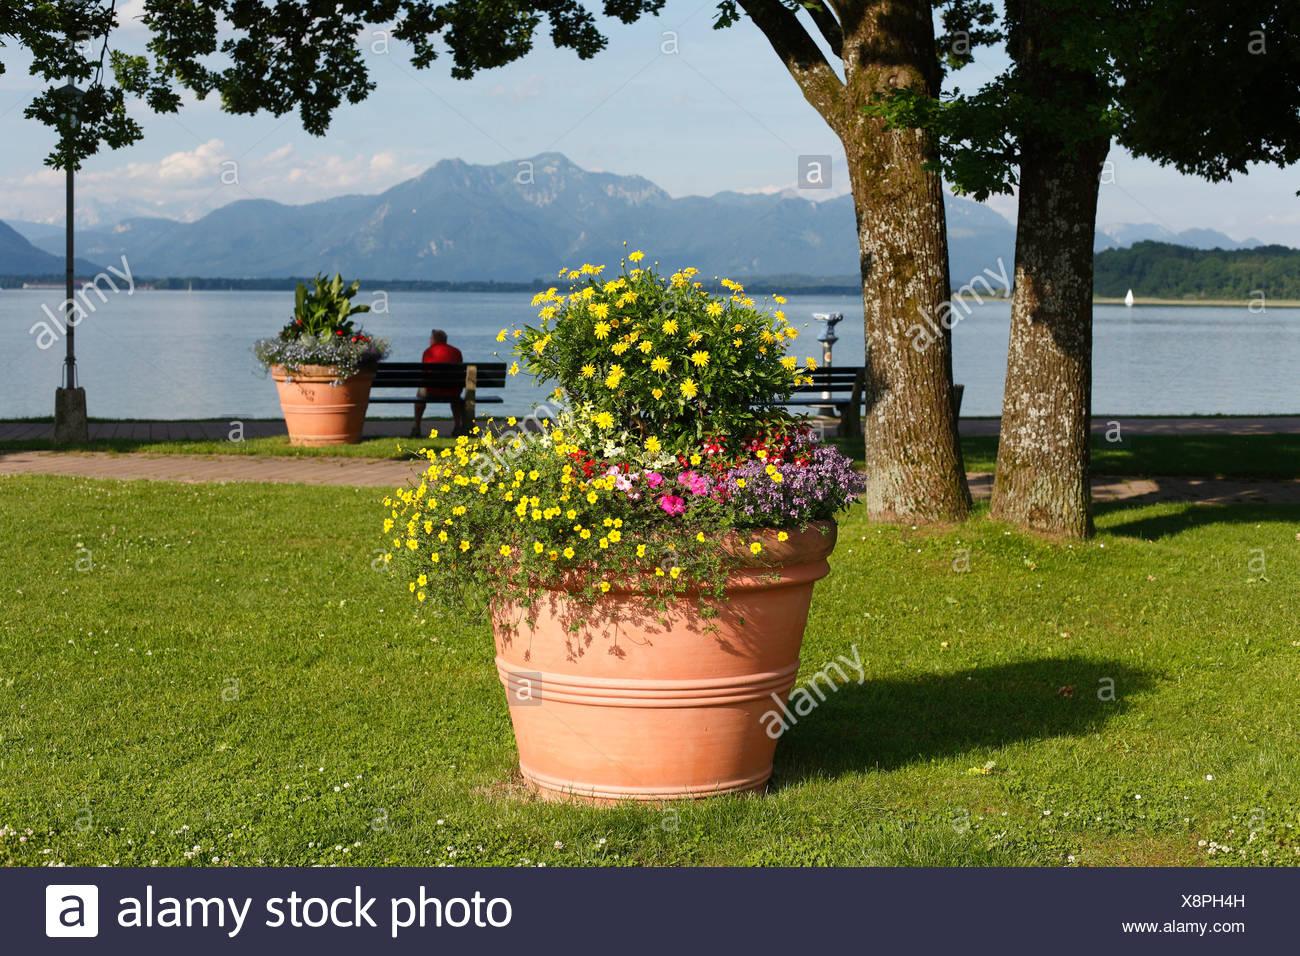 Flower tub on the lakeside promenade in Prien on Lake Chiemsee, Chiemgau, Upper Bavaria, Germany, Europe Stock Photo